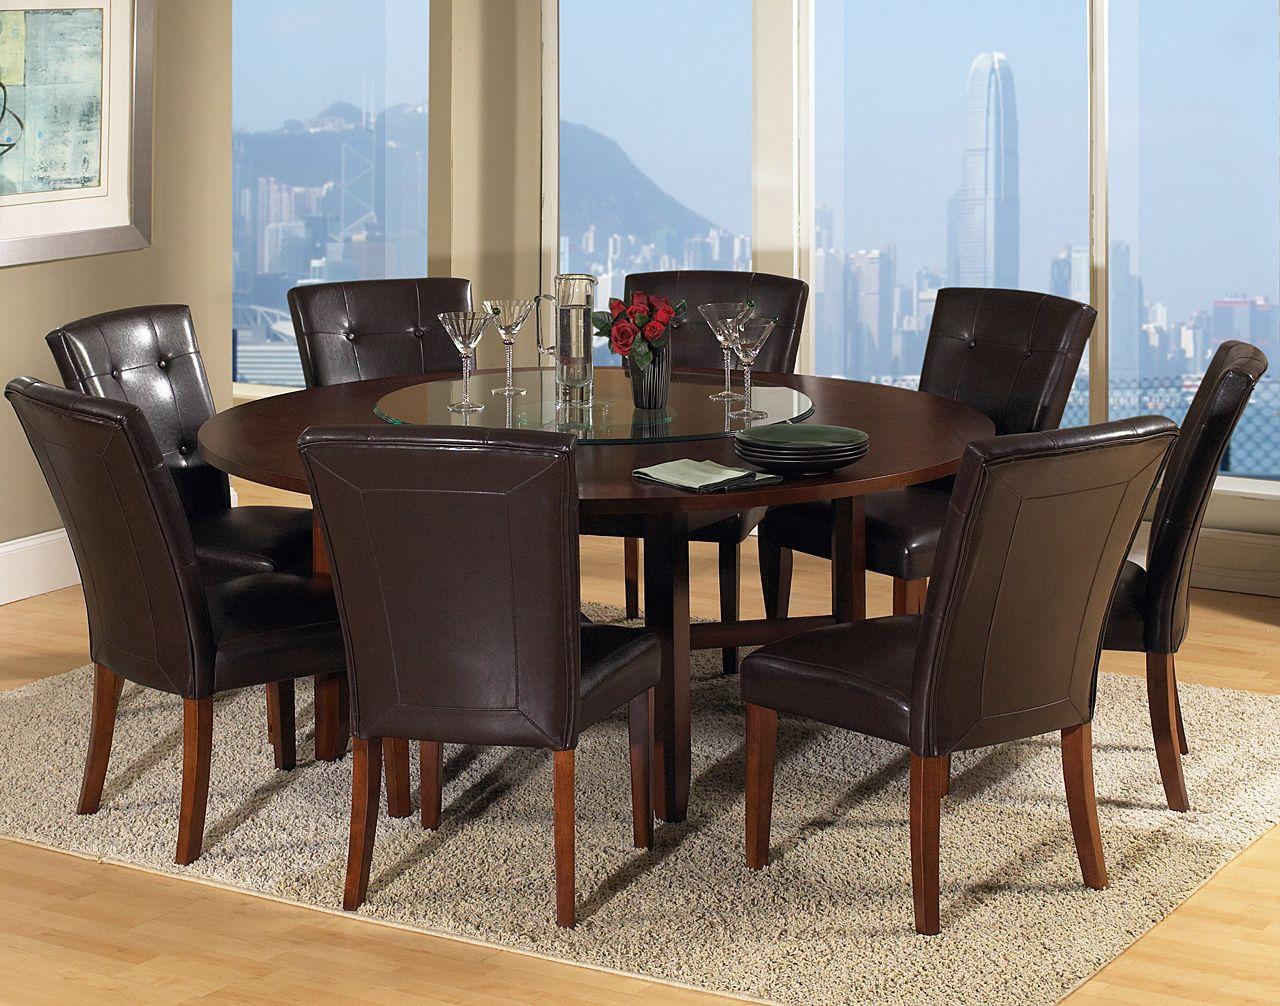 Round Dining Table For 8 People Comedor Redonda Decoracion Del